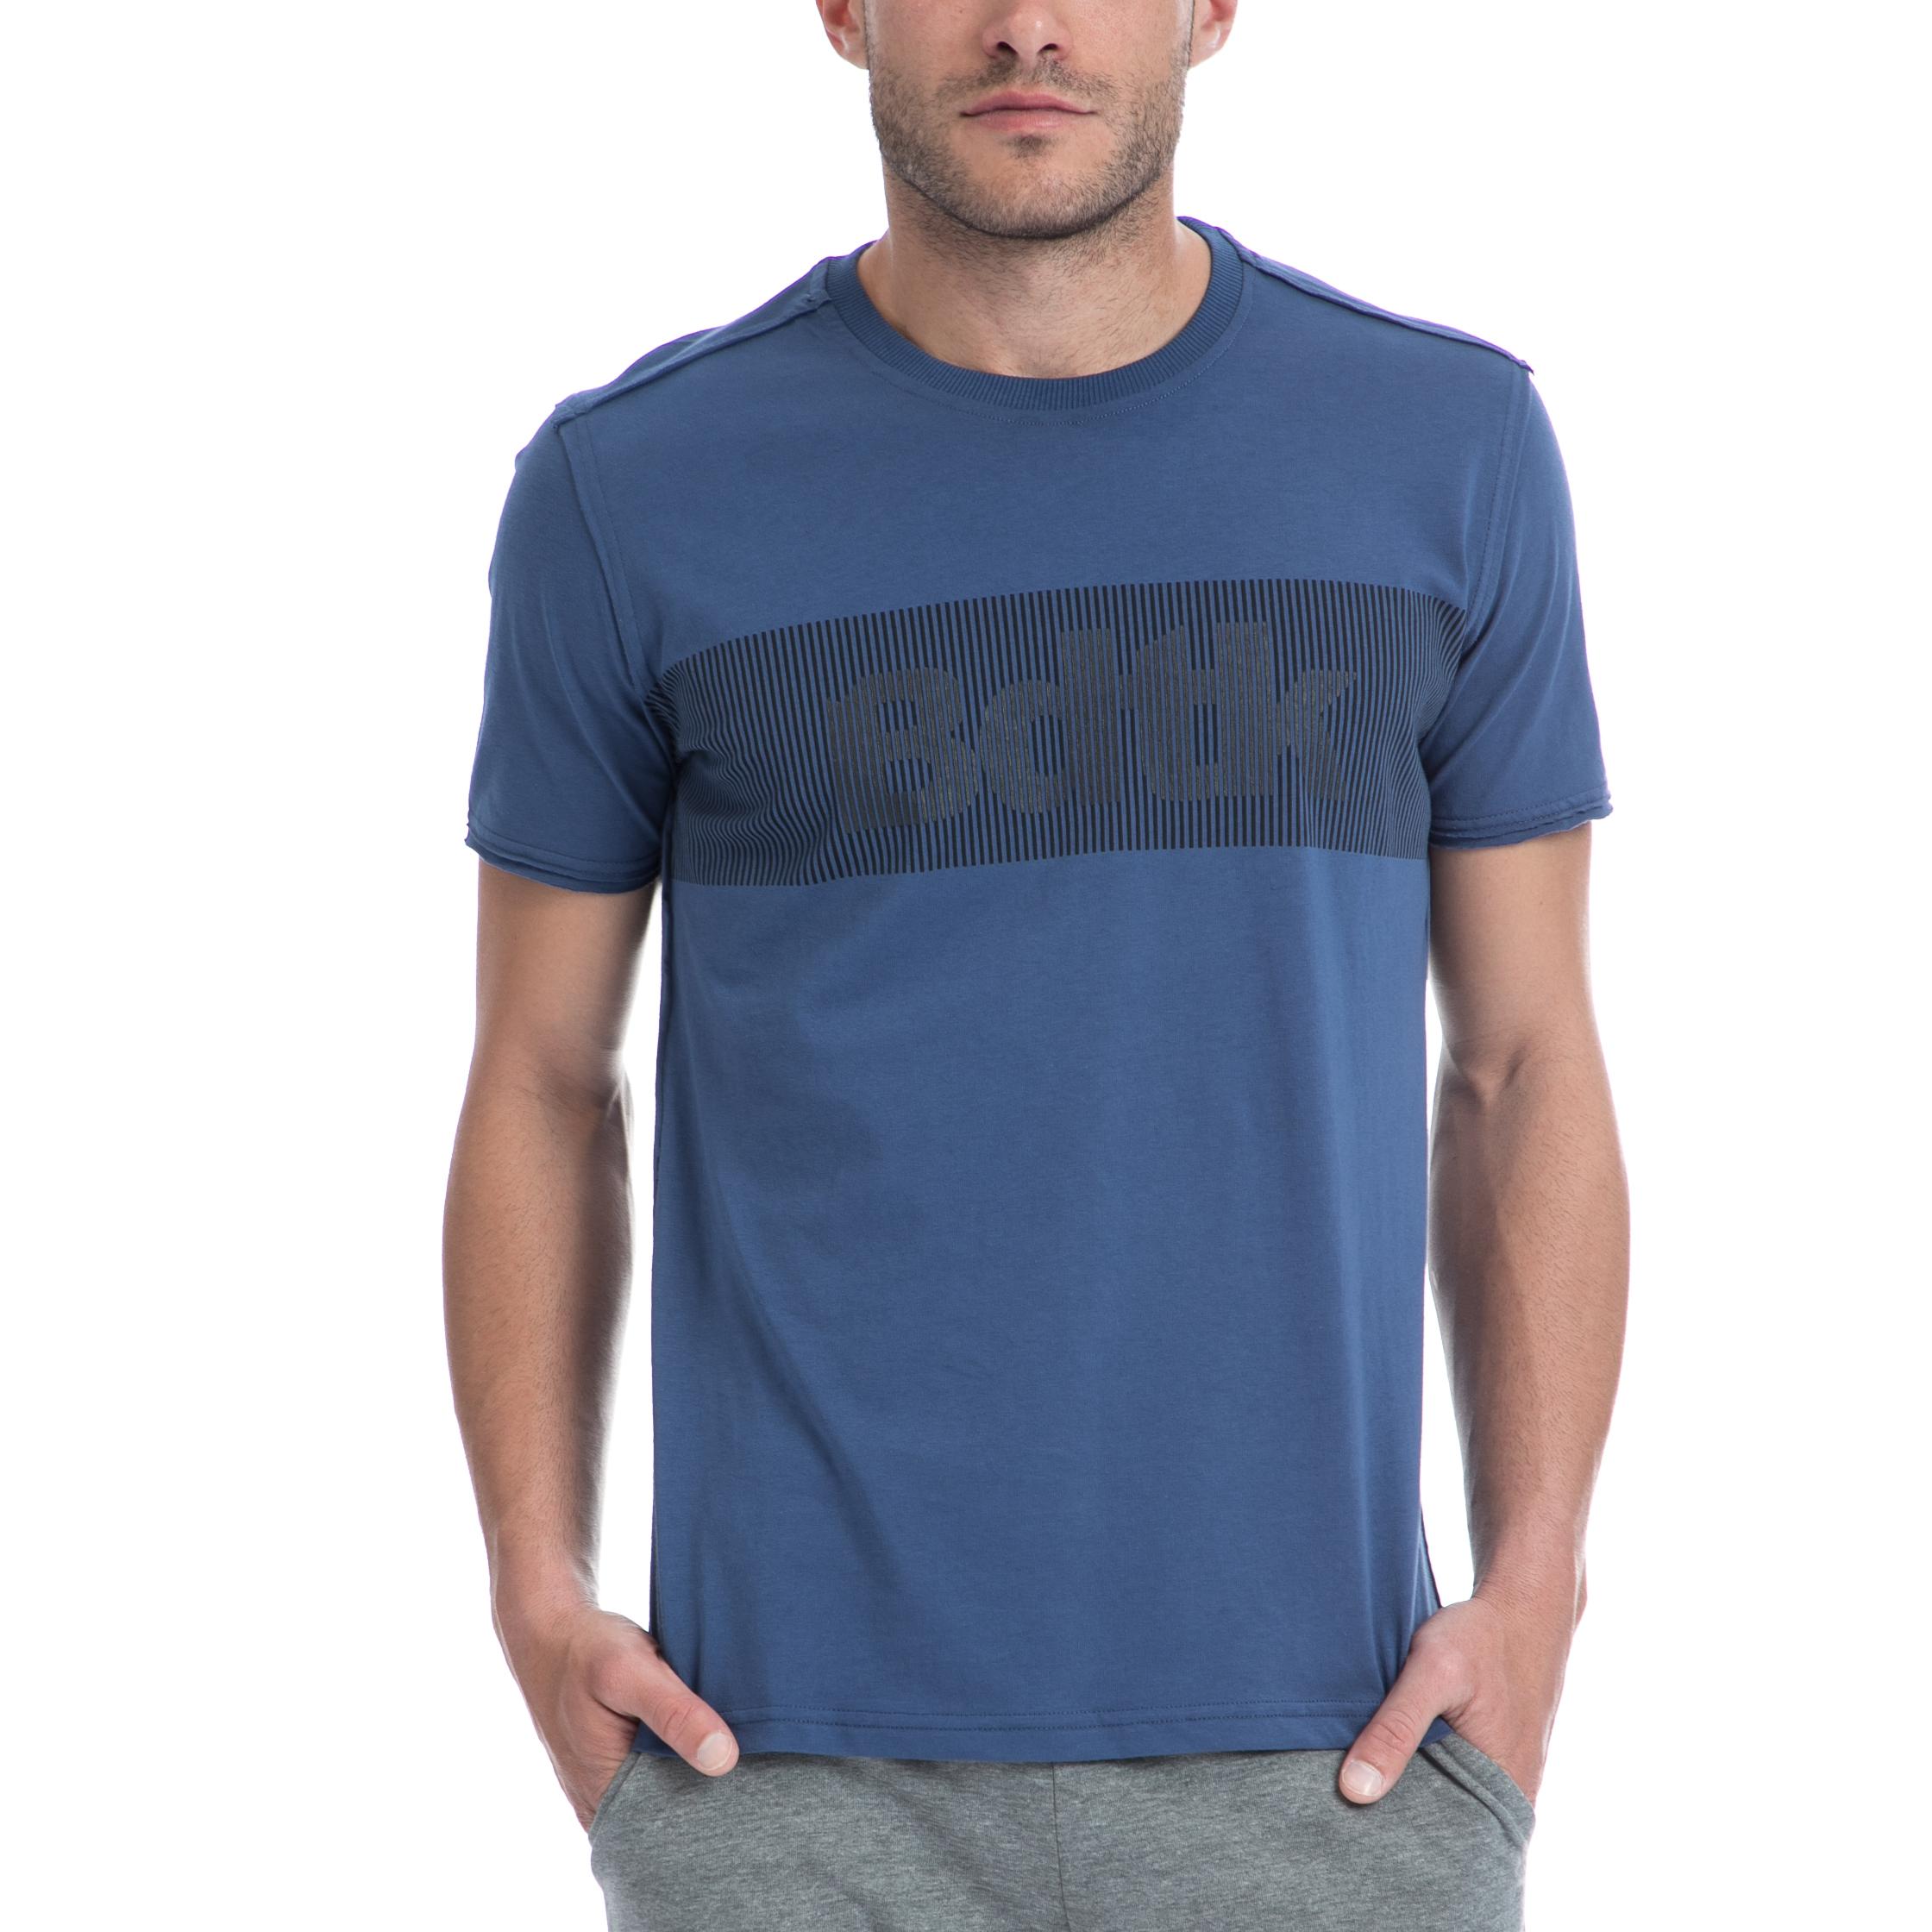 BODYTALK - Ανδρική μπλούζα BODYTALK μπλε ανδρικά ρούχα αθλητικά t shirt